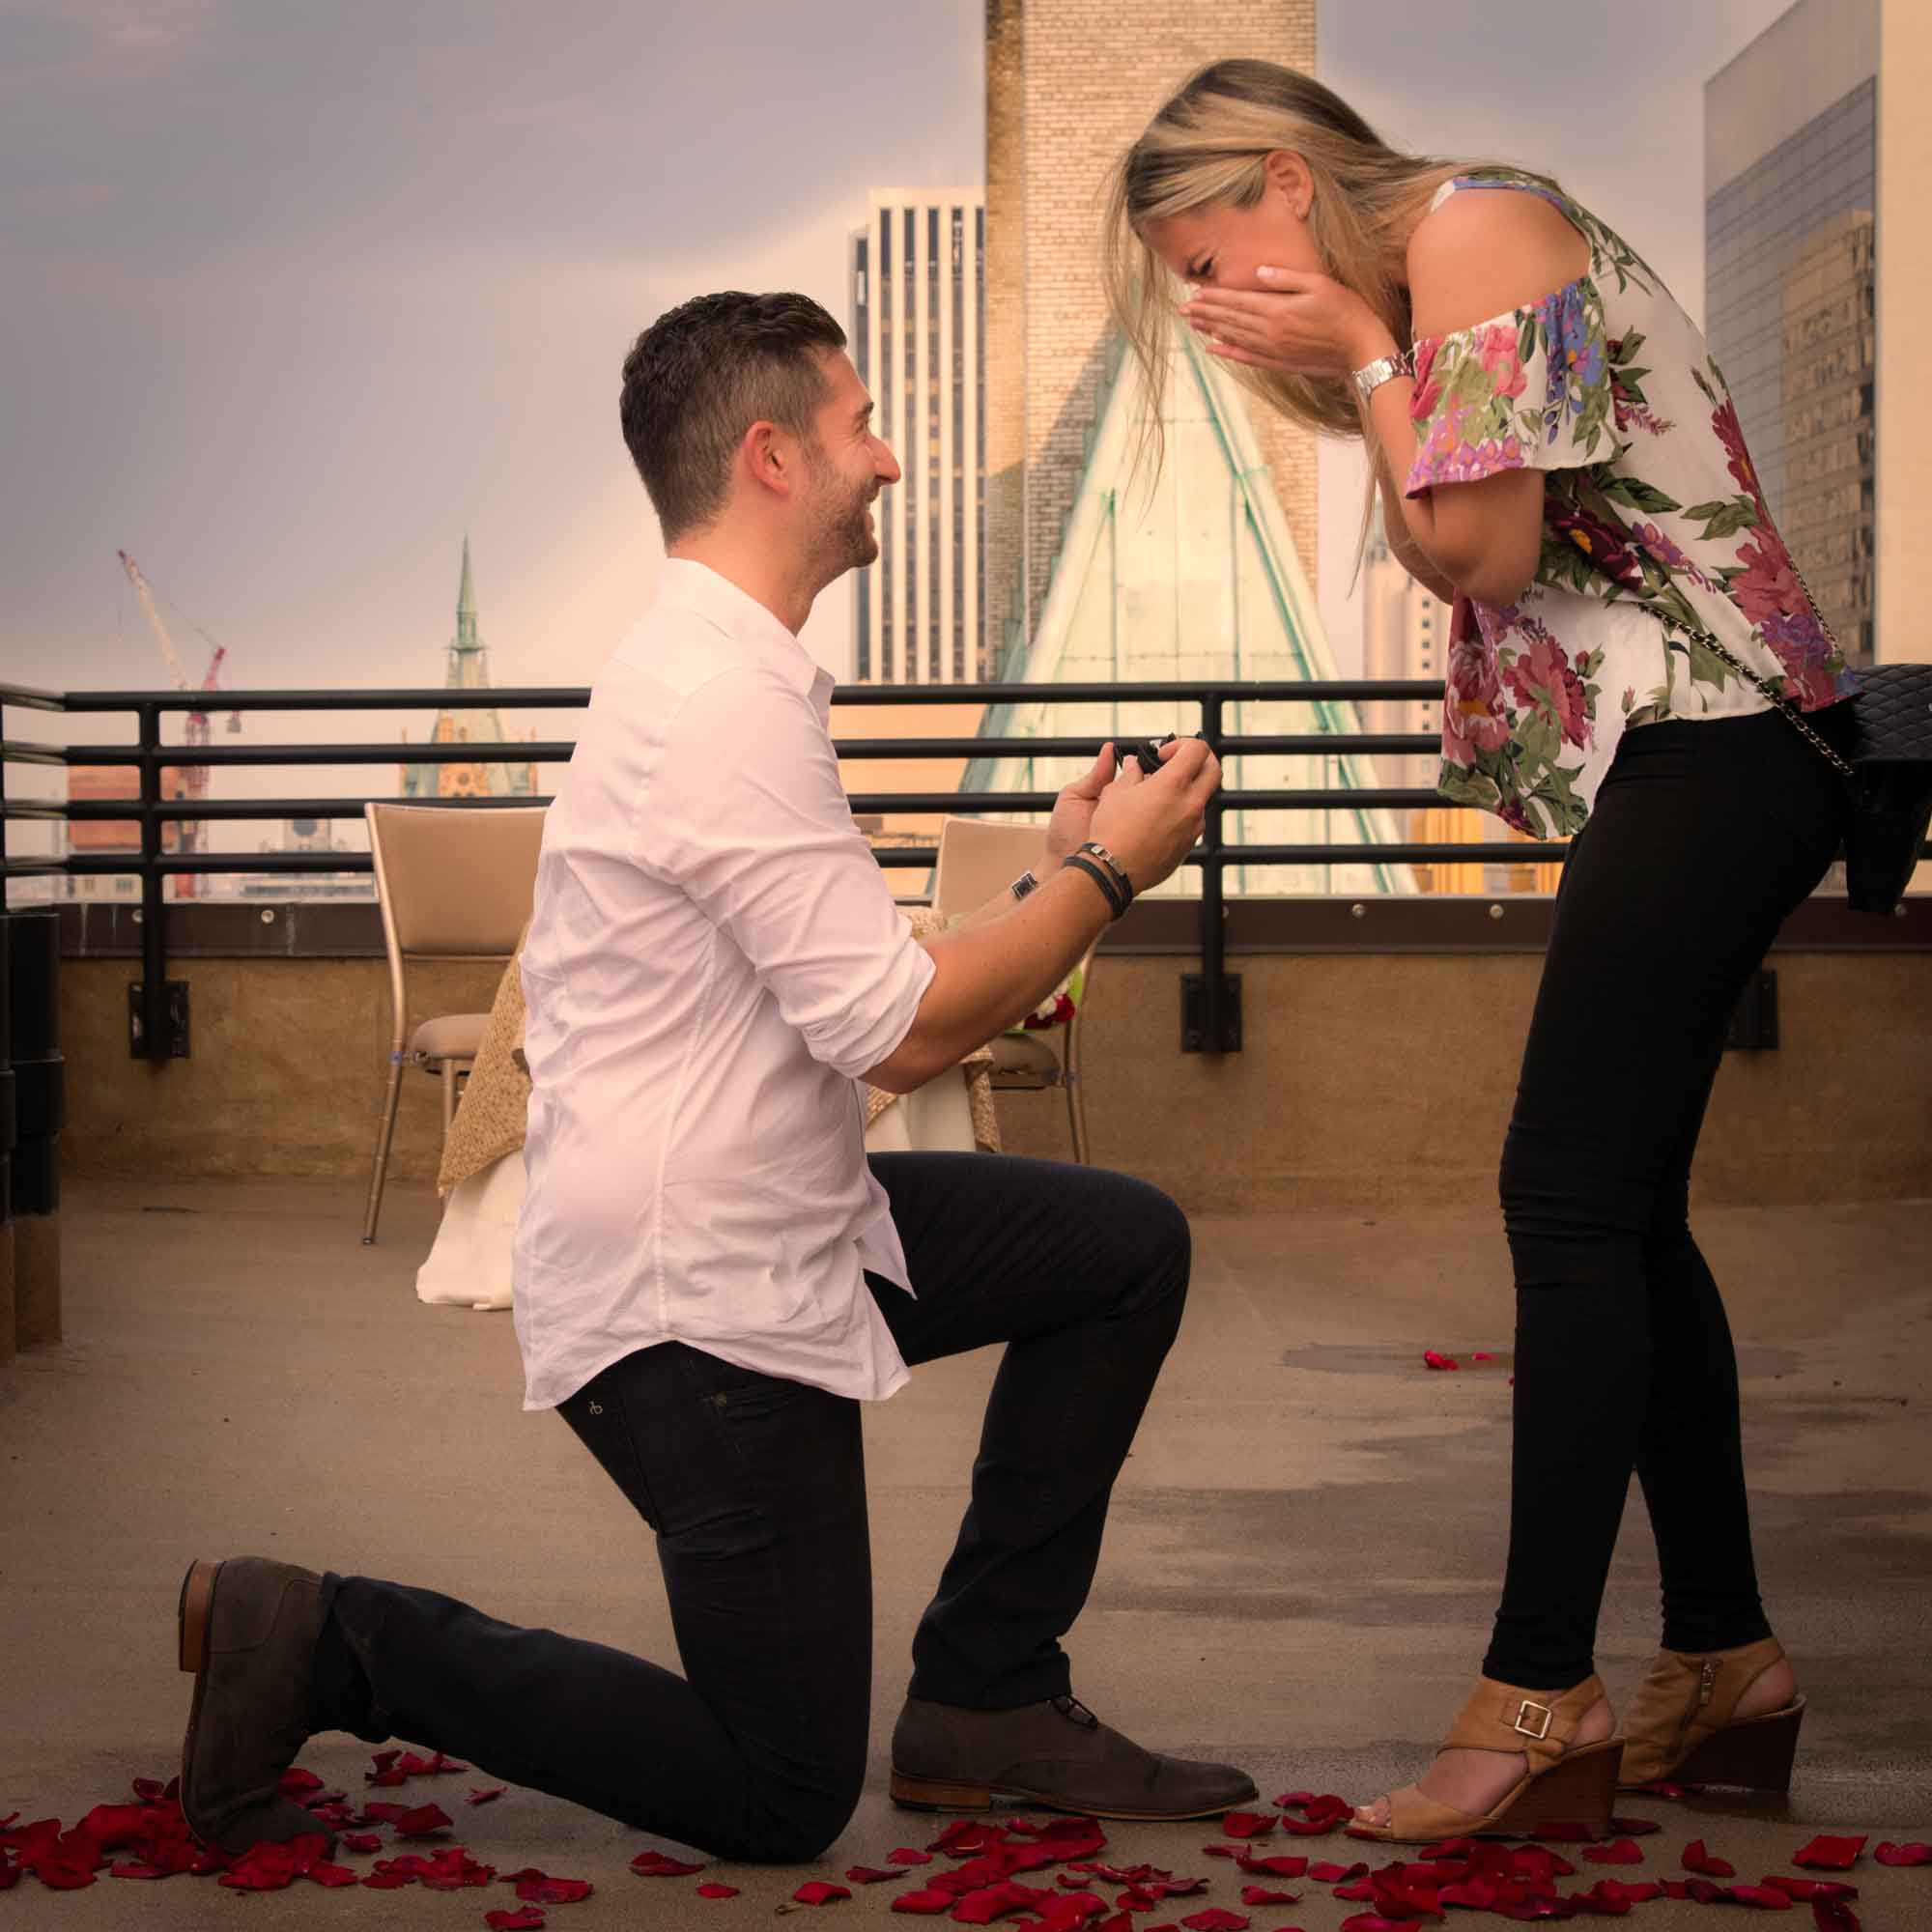 Weddings-Engagements-Jamie-Levine-Photography-New-York-NYC-15.jpg